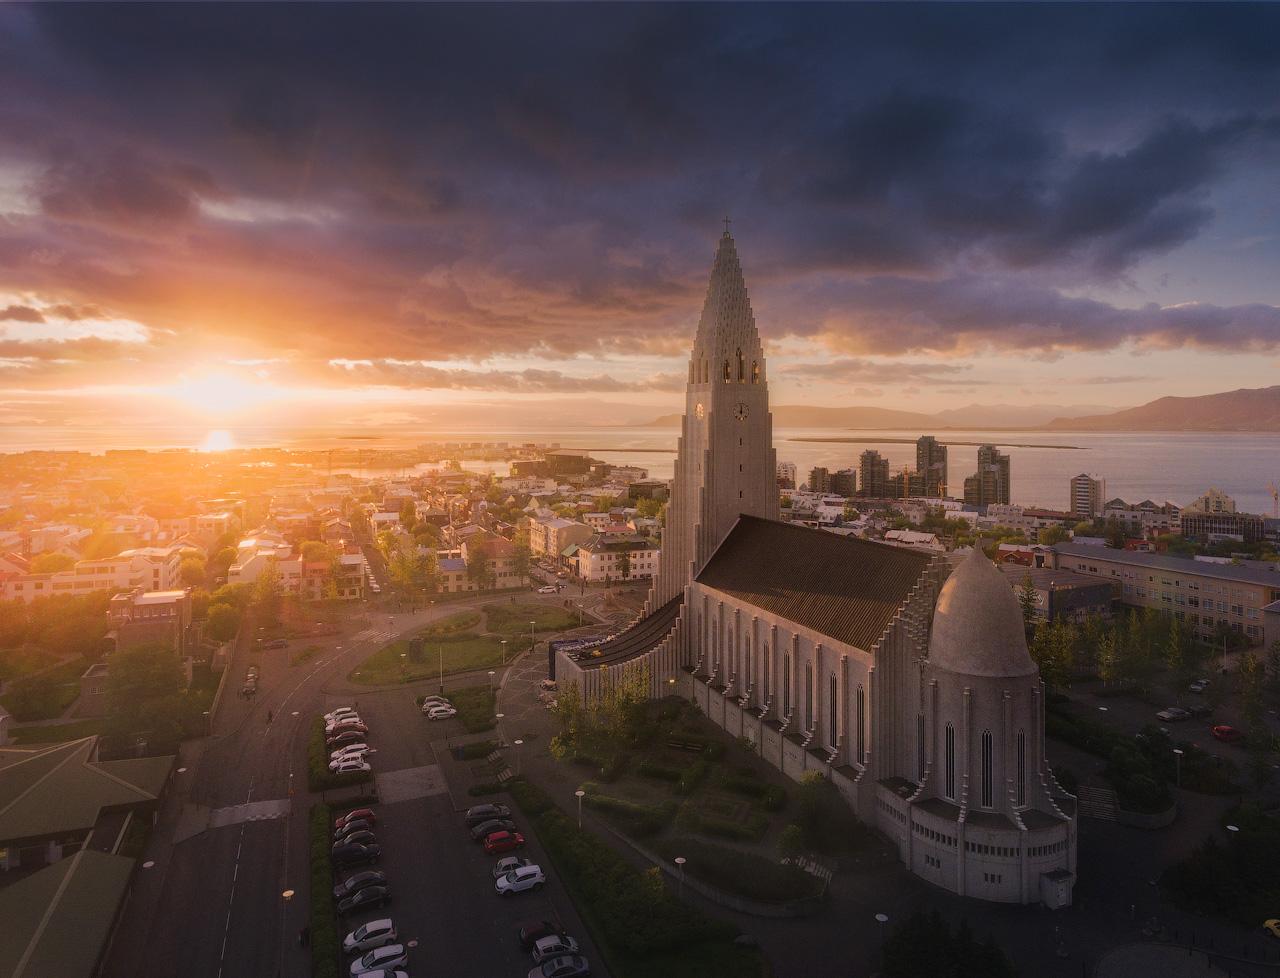 9 Day Photo Workshop Capturing Autumn in Iceland - day 9